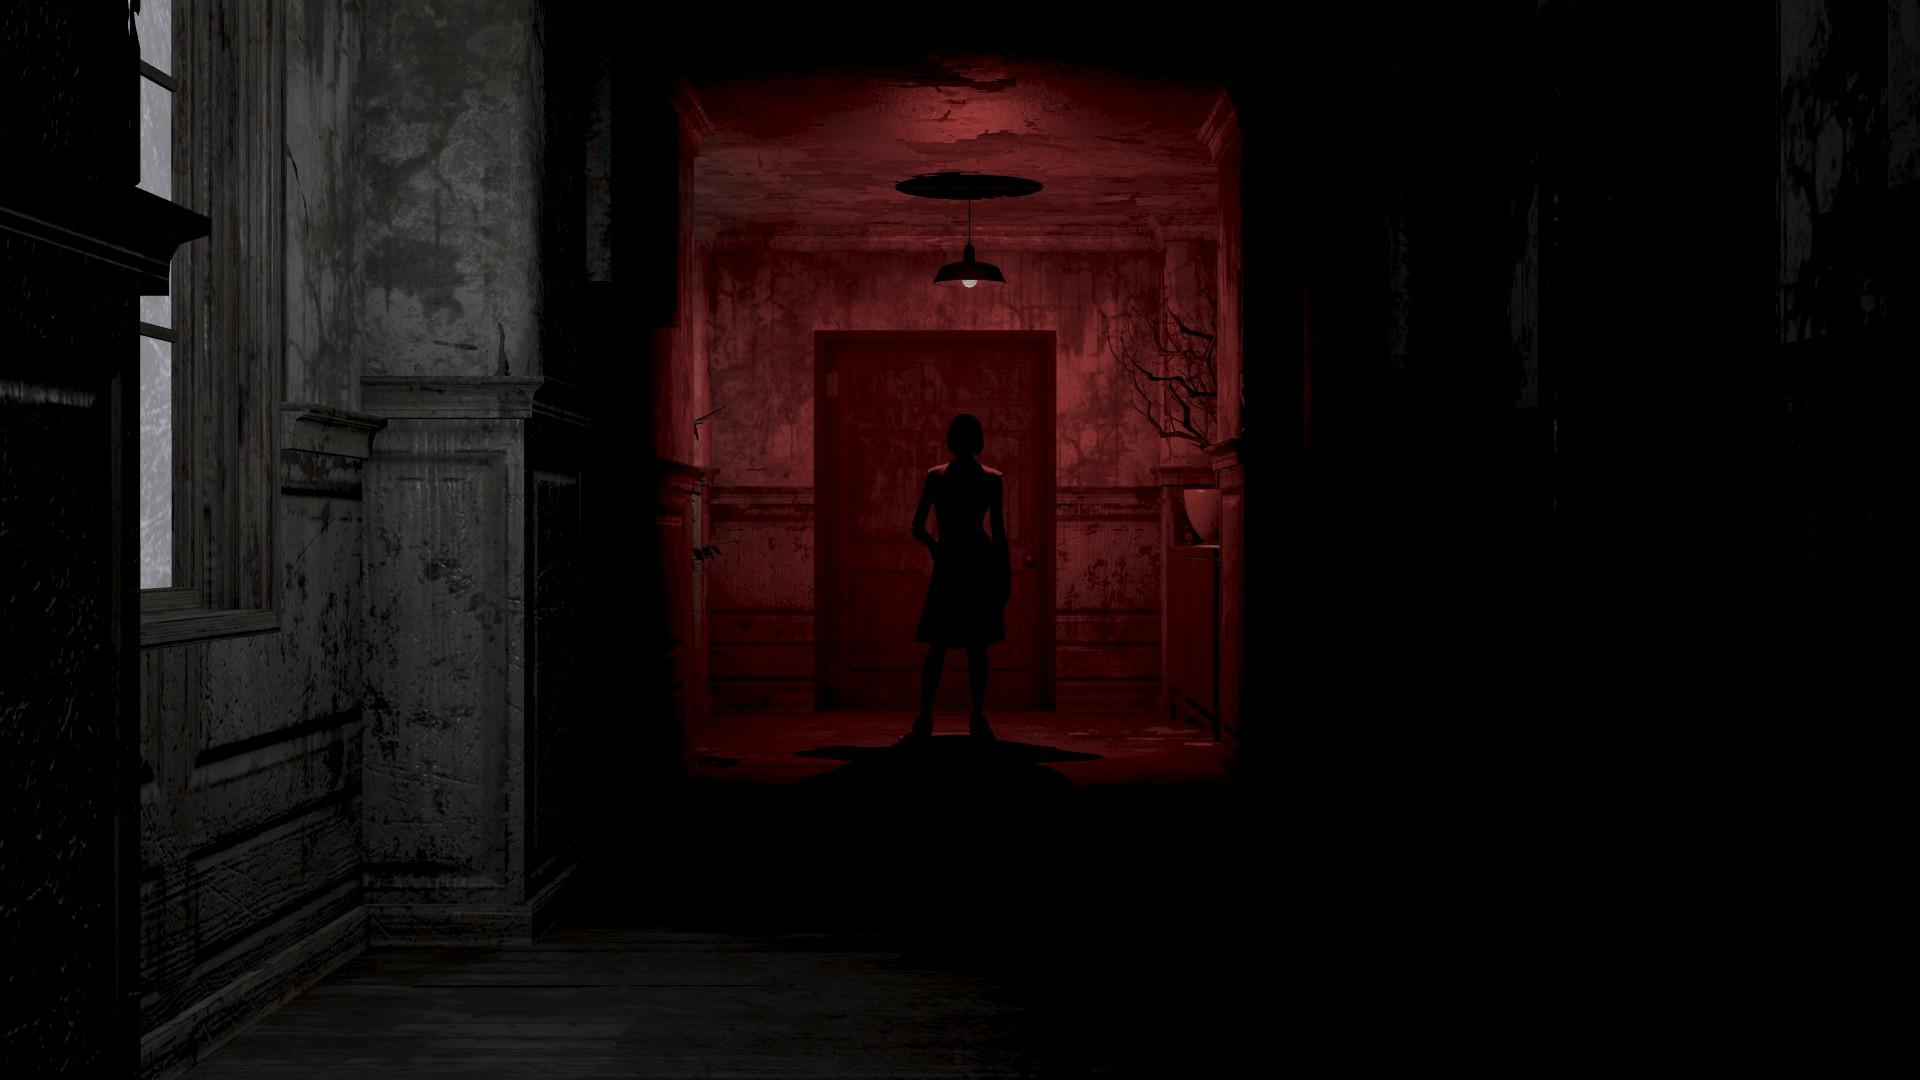 Claustrophobia - хоррор-мод в стиле Silent Hill 2 со скрипучими коридорами и Когтями смерти